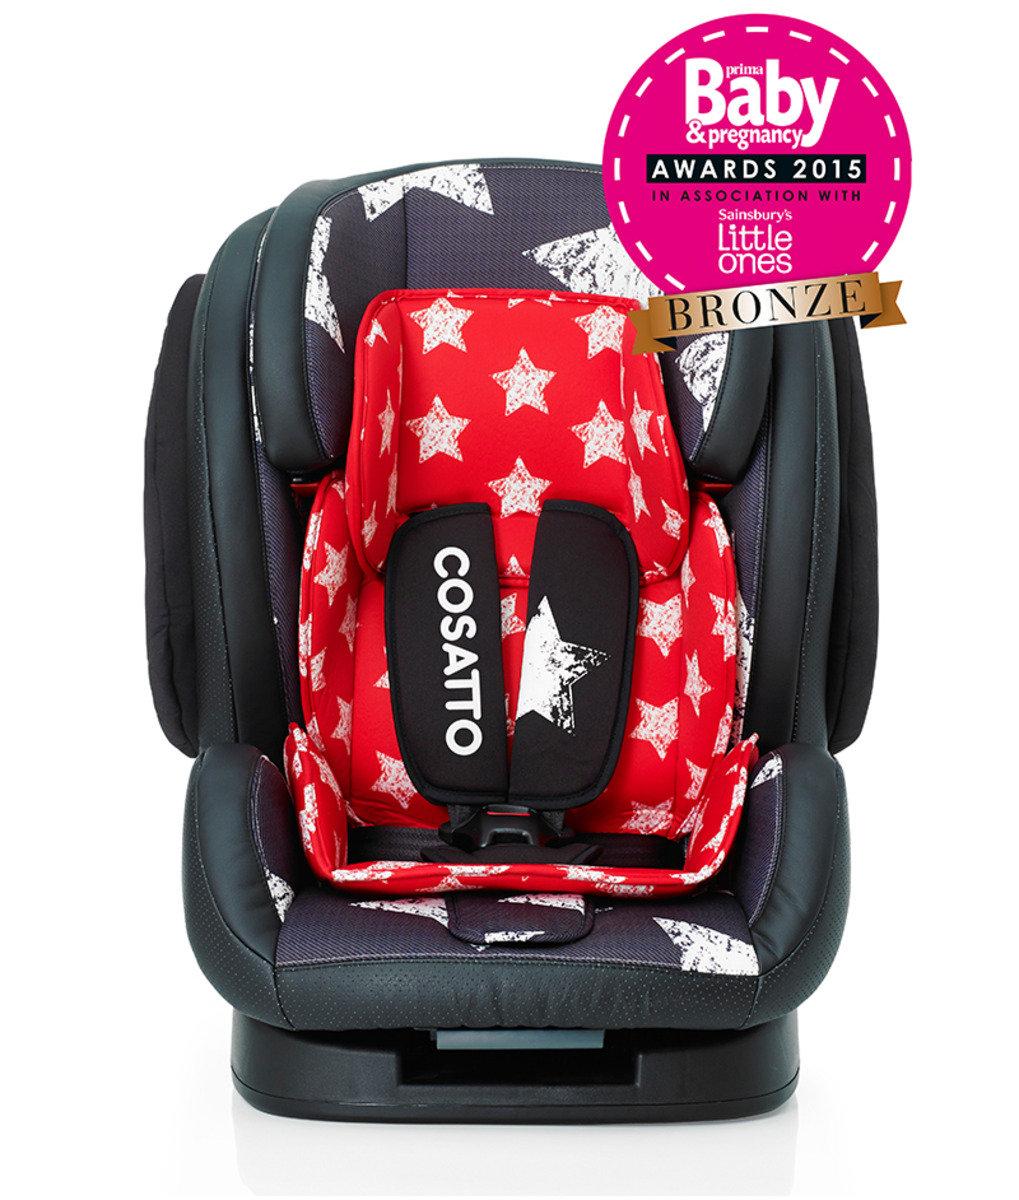 英國 Cosatto Hug Group 123 兒童汽車安全座椅 – Hipstar